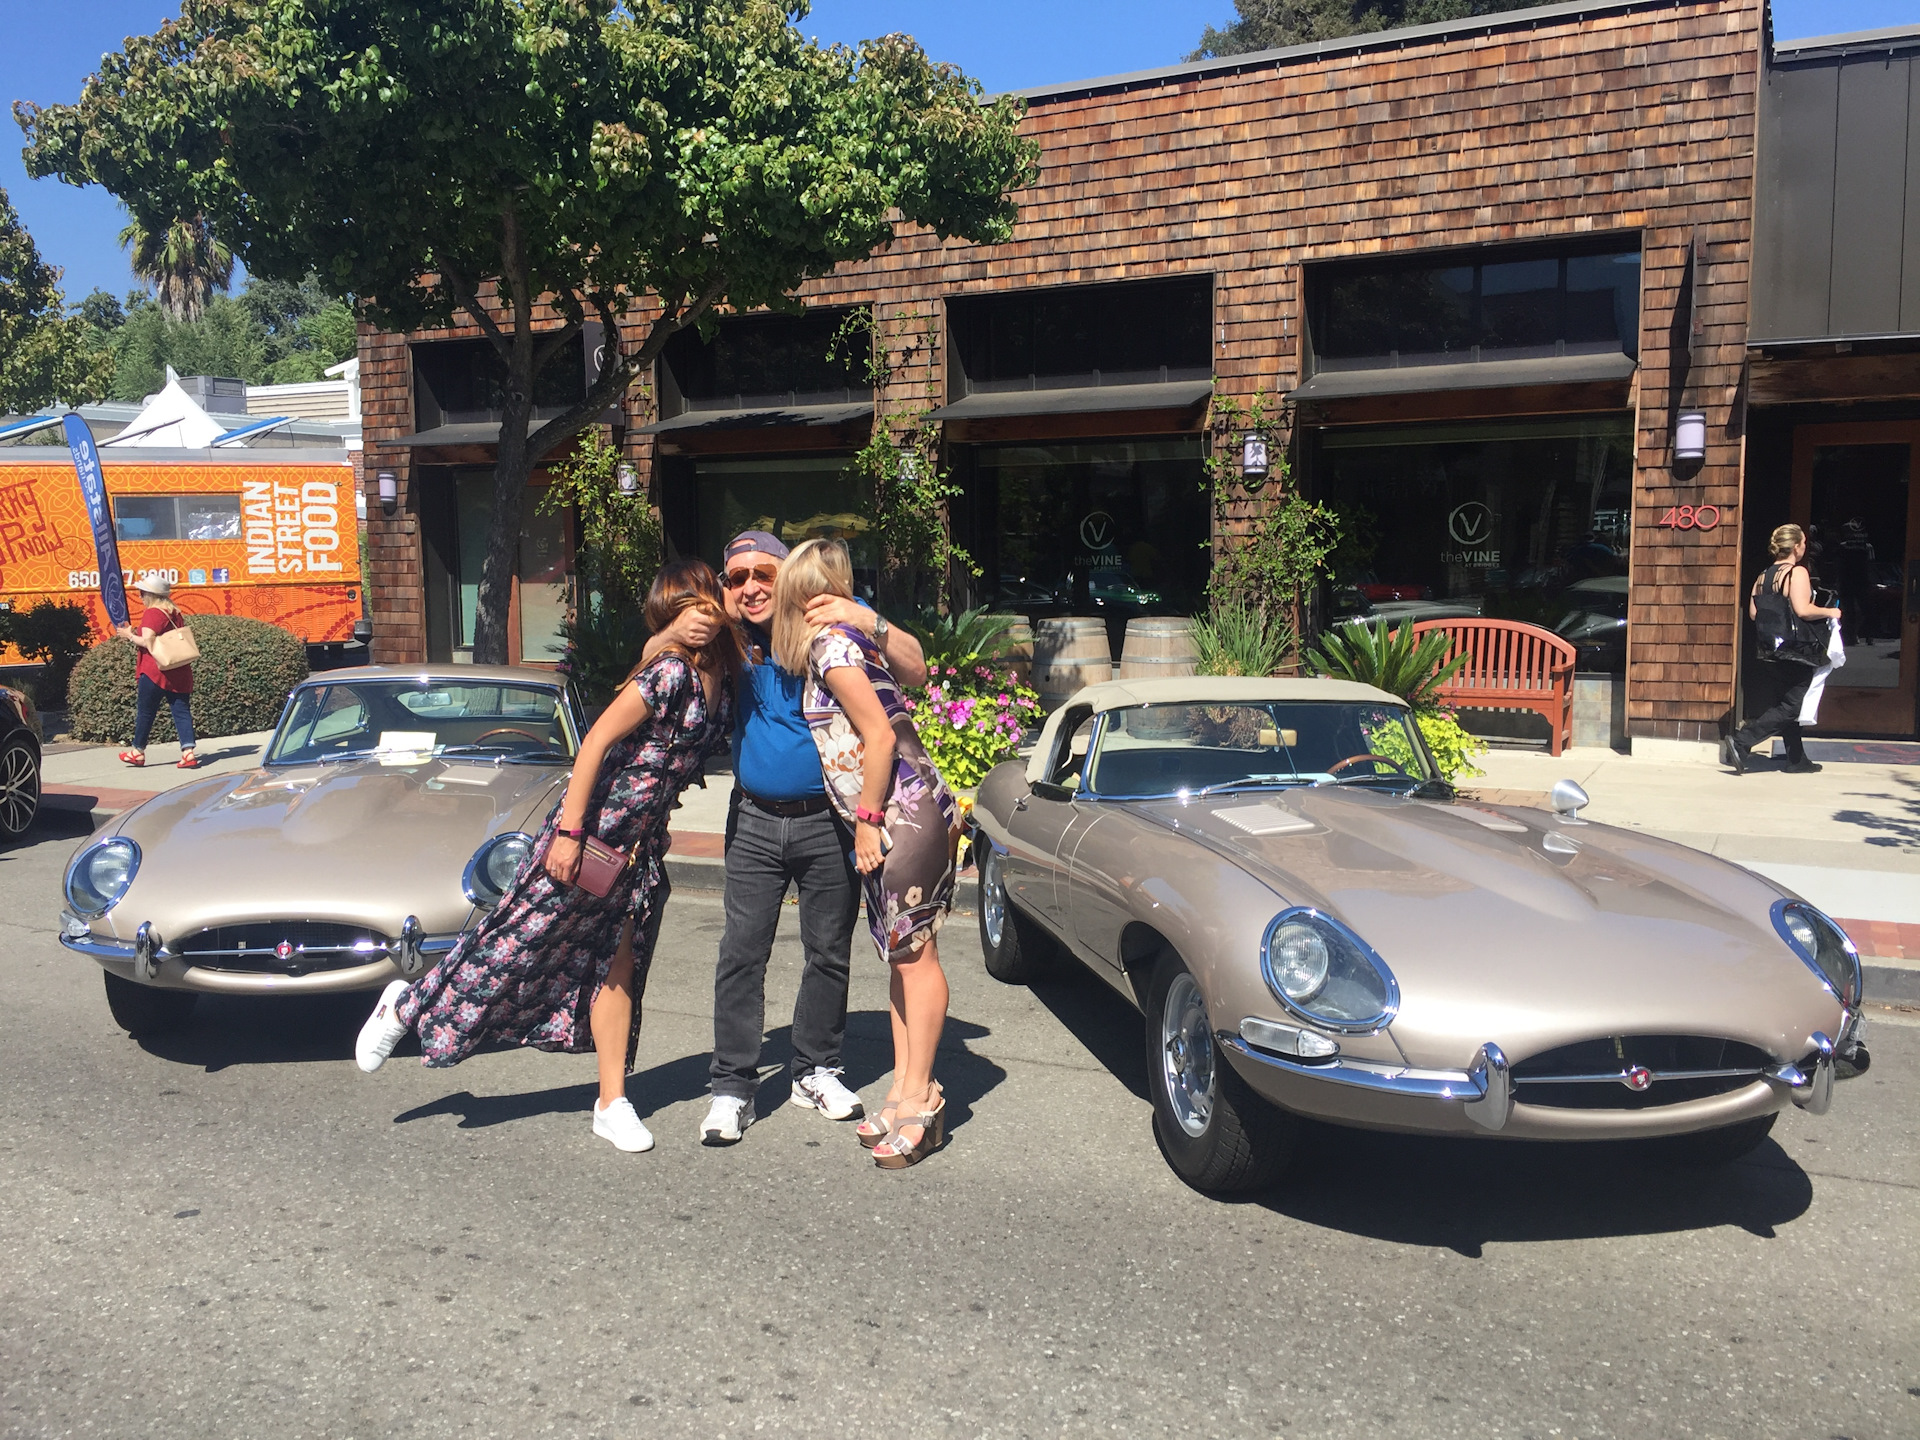 Danville California Car show First Place — DRIVE2